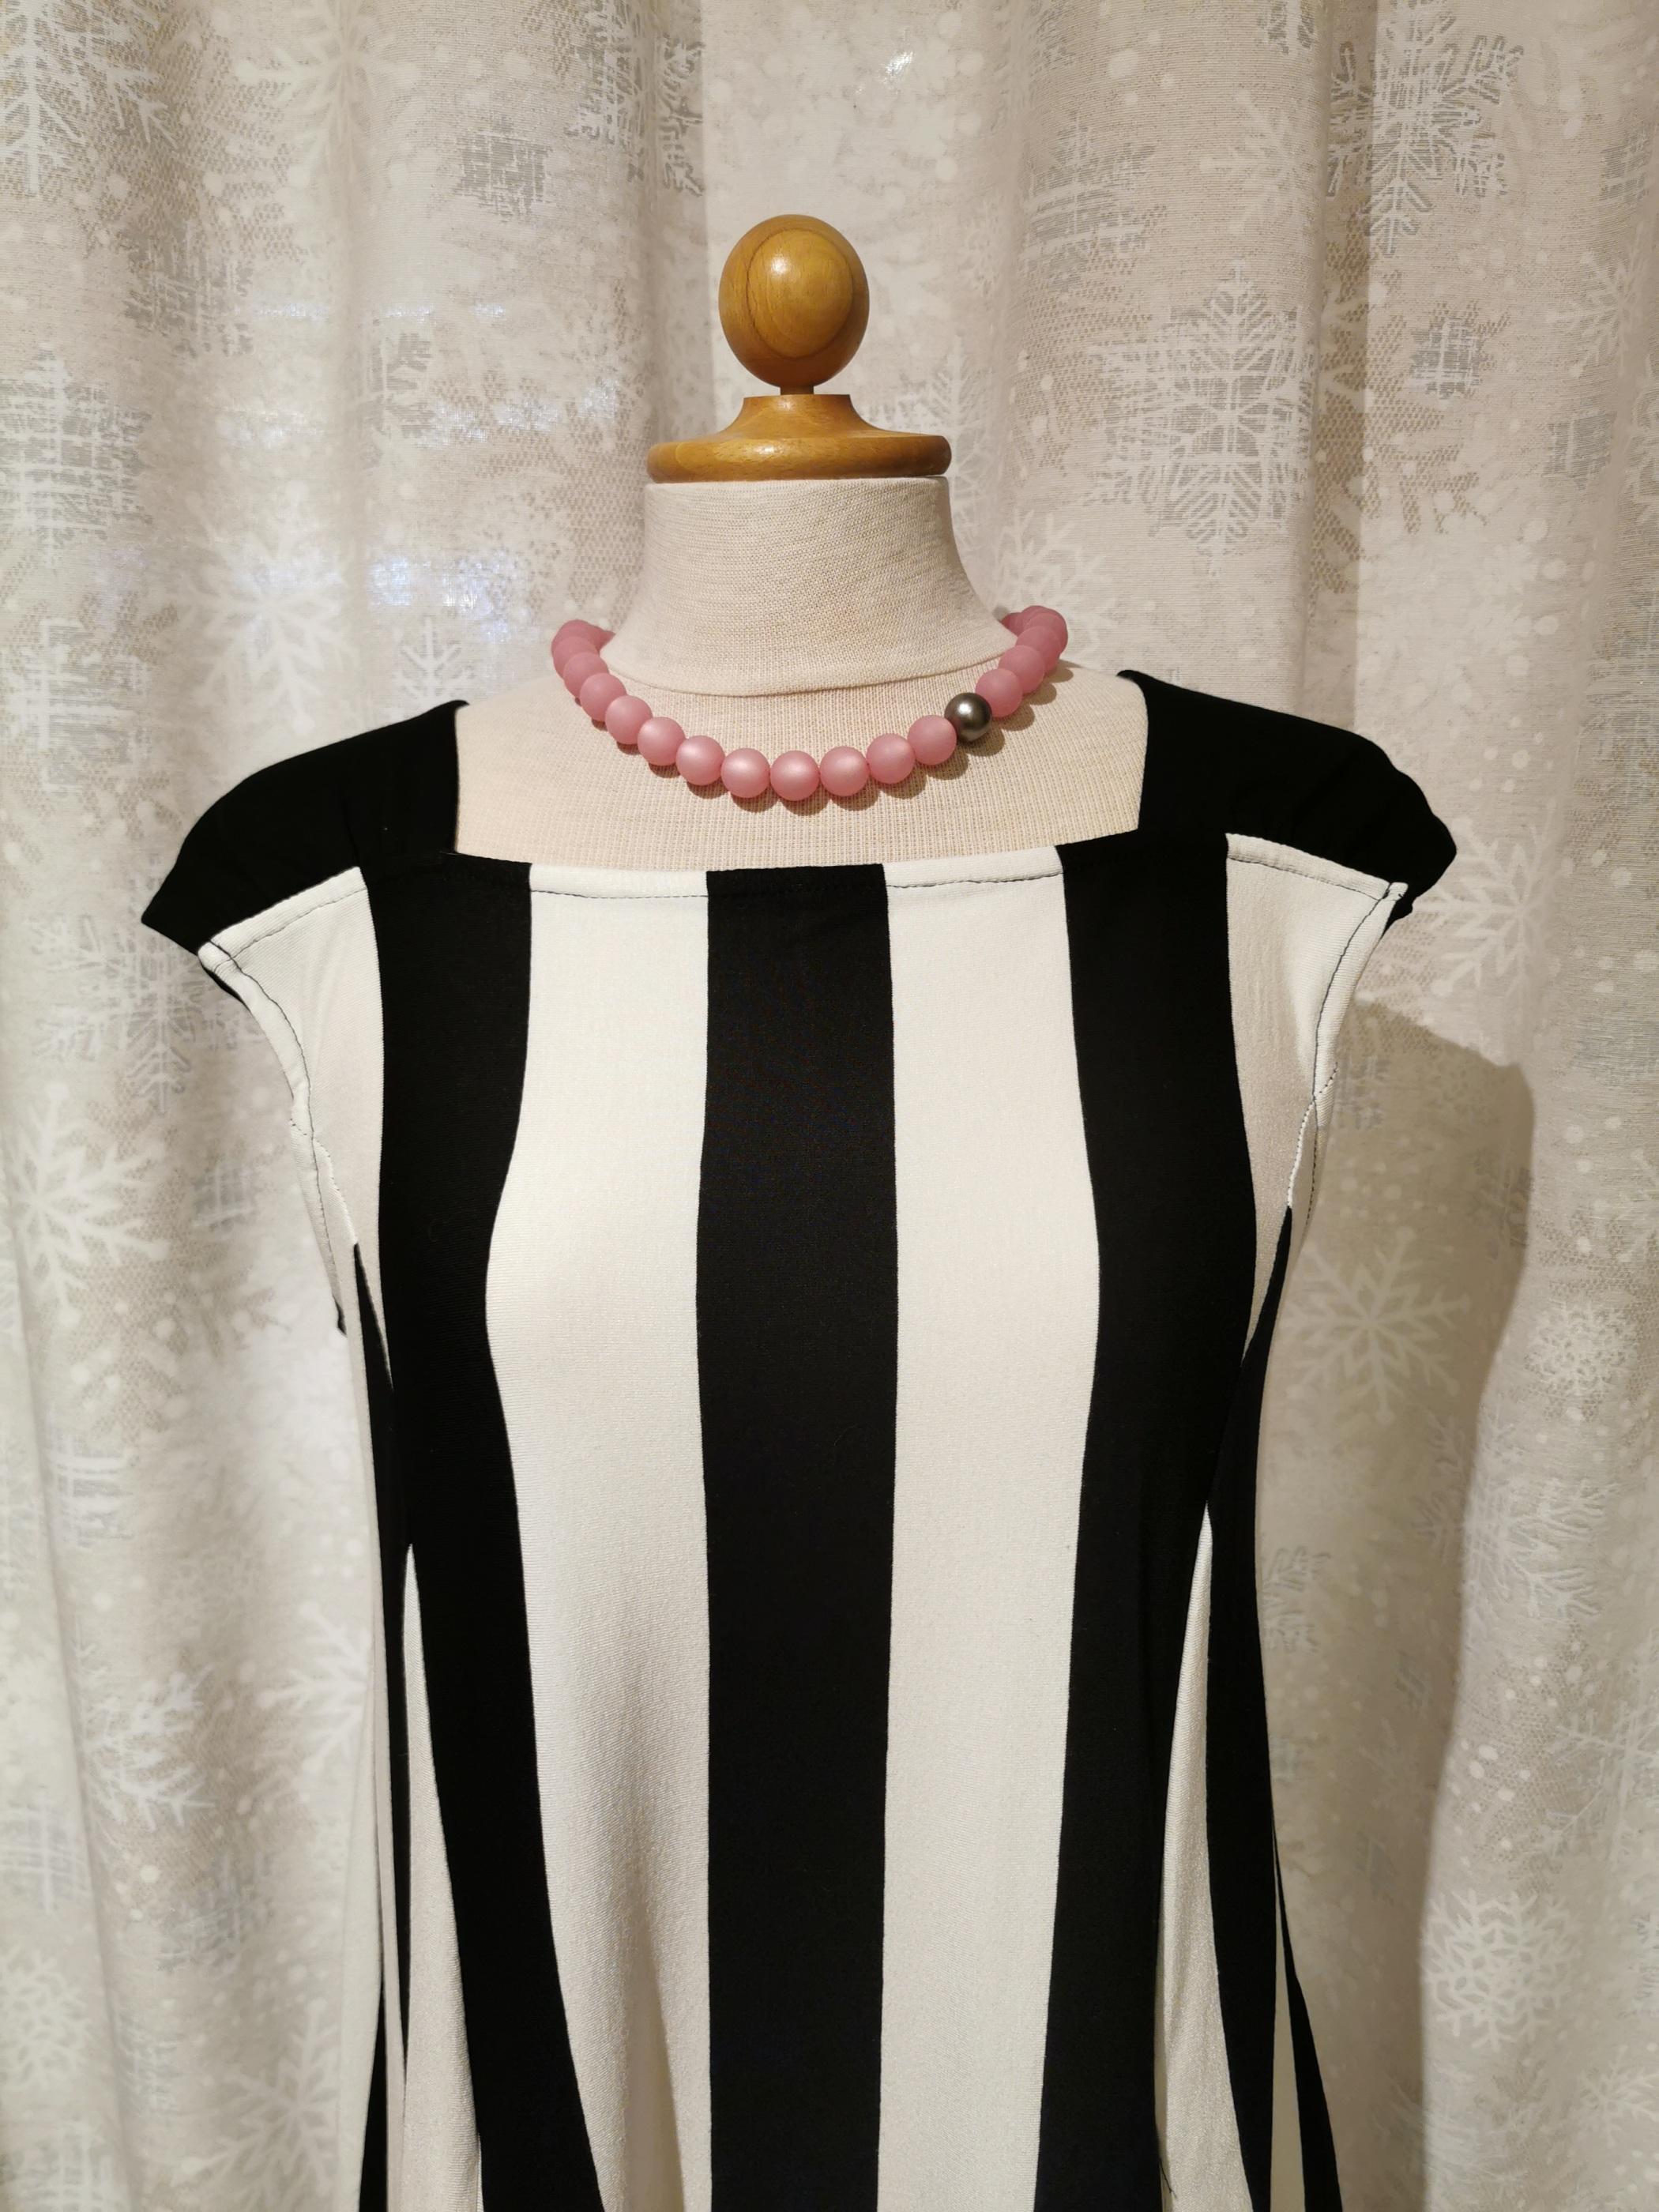 Baldino klänning 18-546B Skattkistan